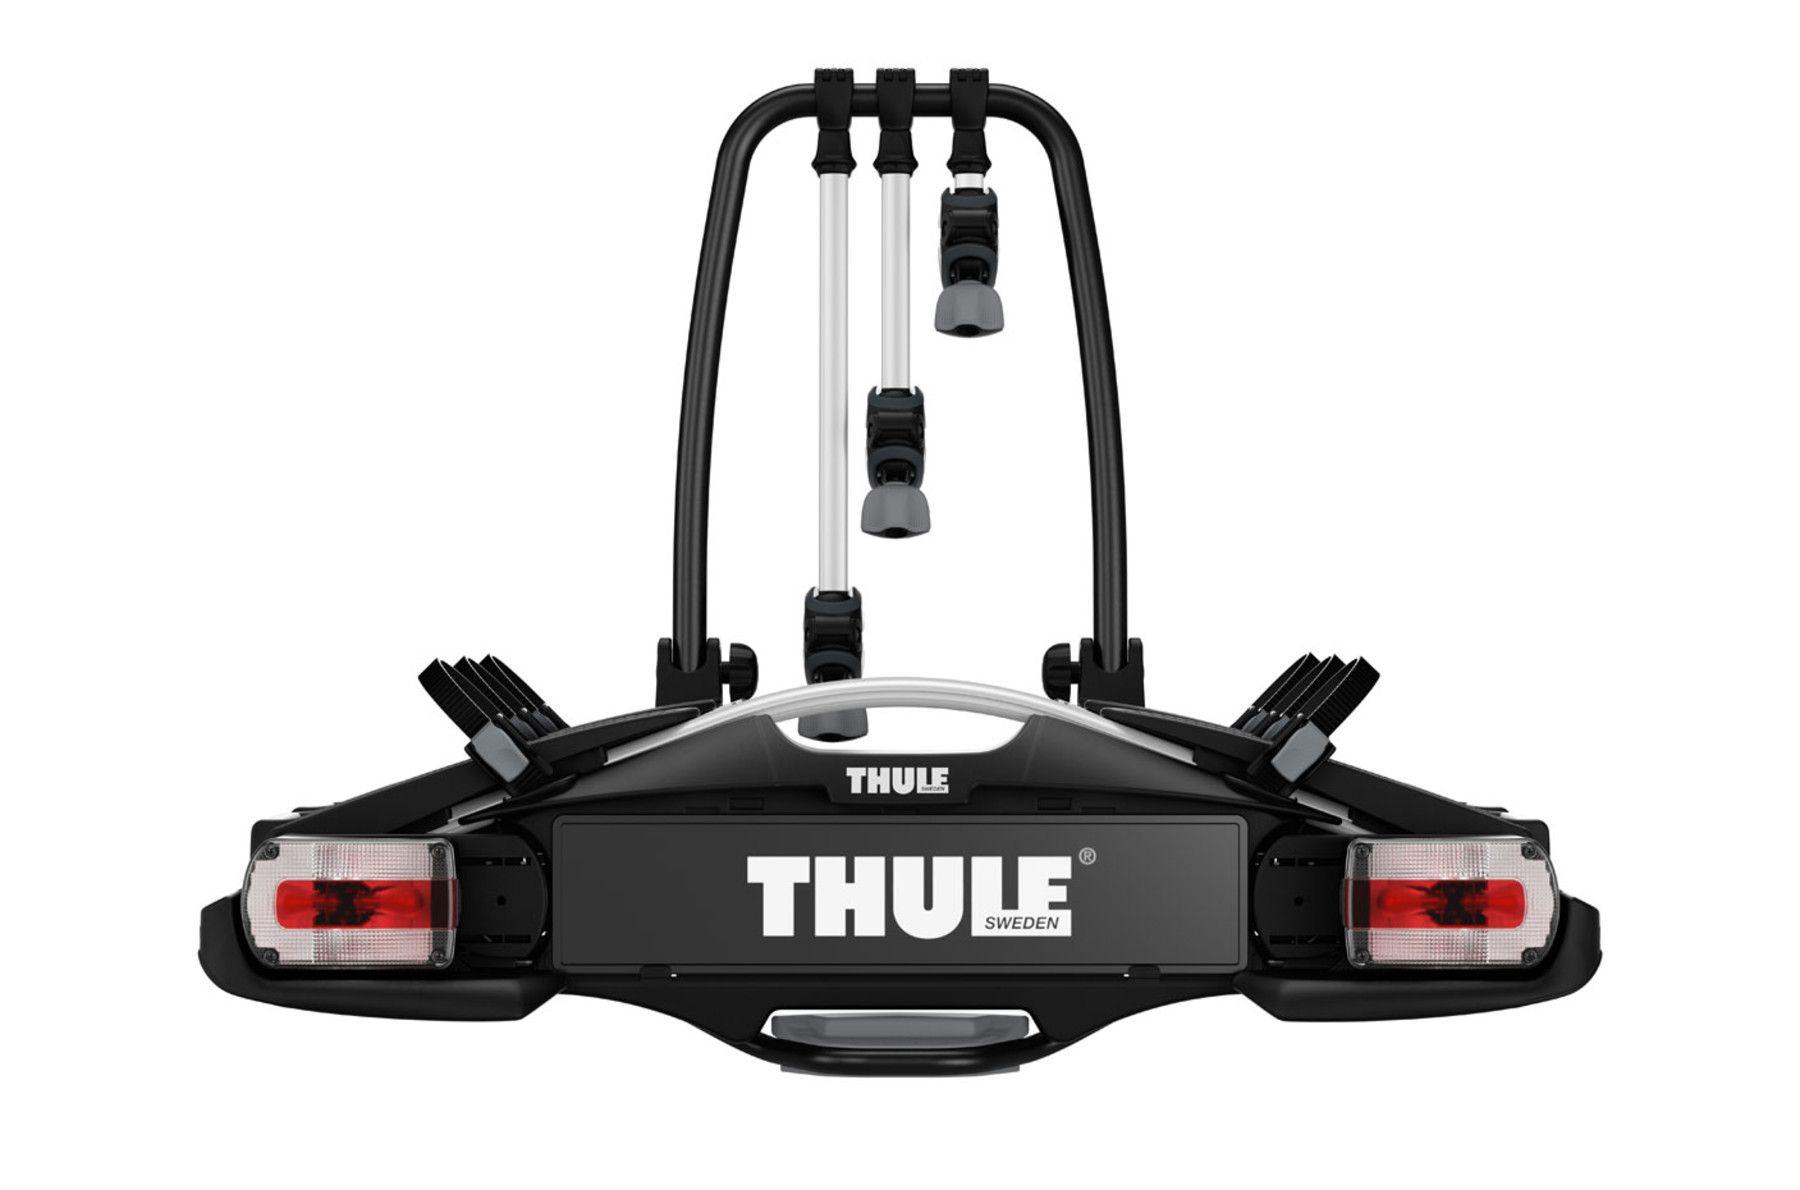 Suporte de Engate para Bicicleta Thule VeloCompact 3 ou 4 Bicicletas